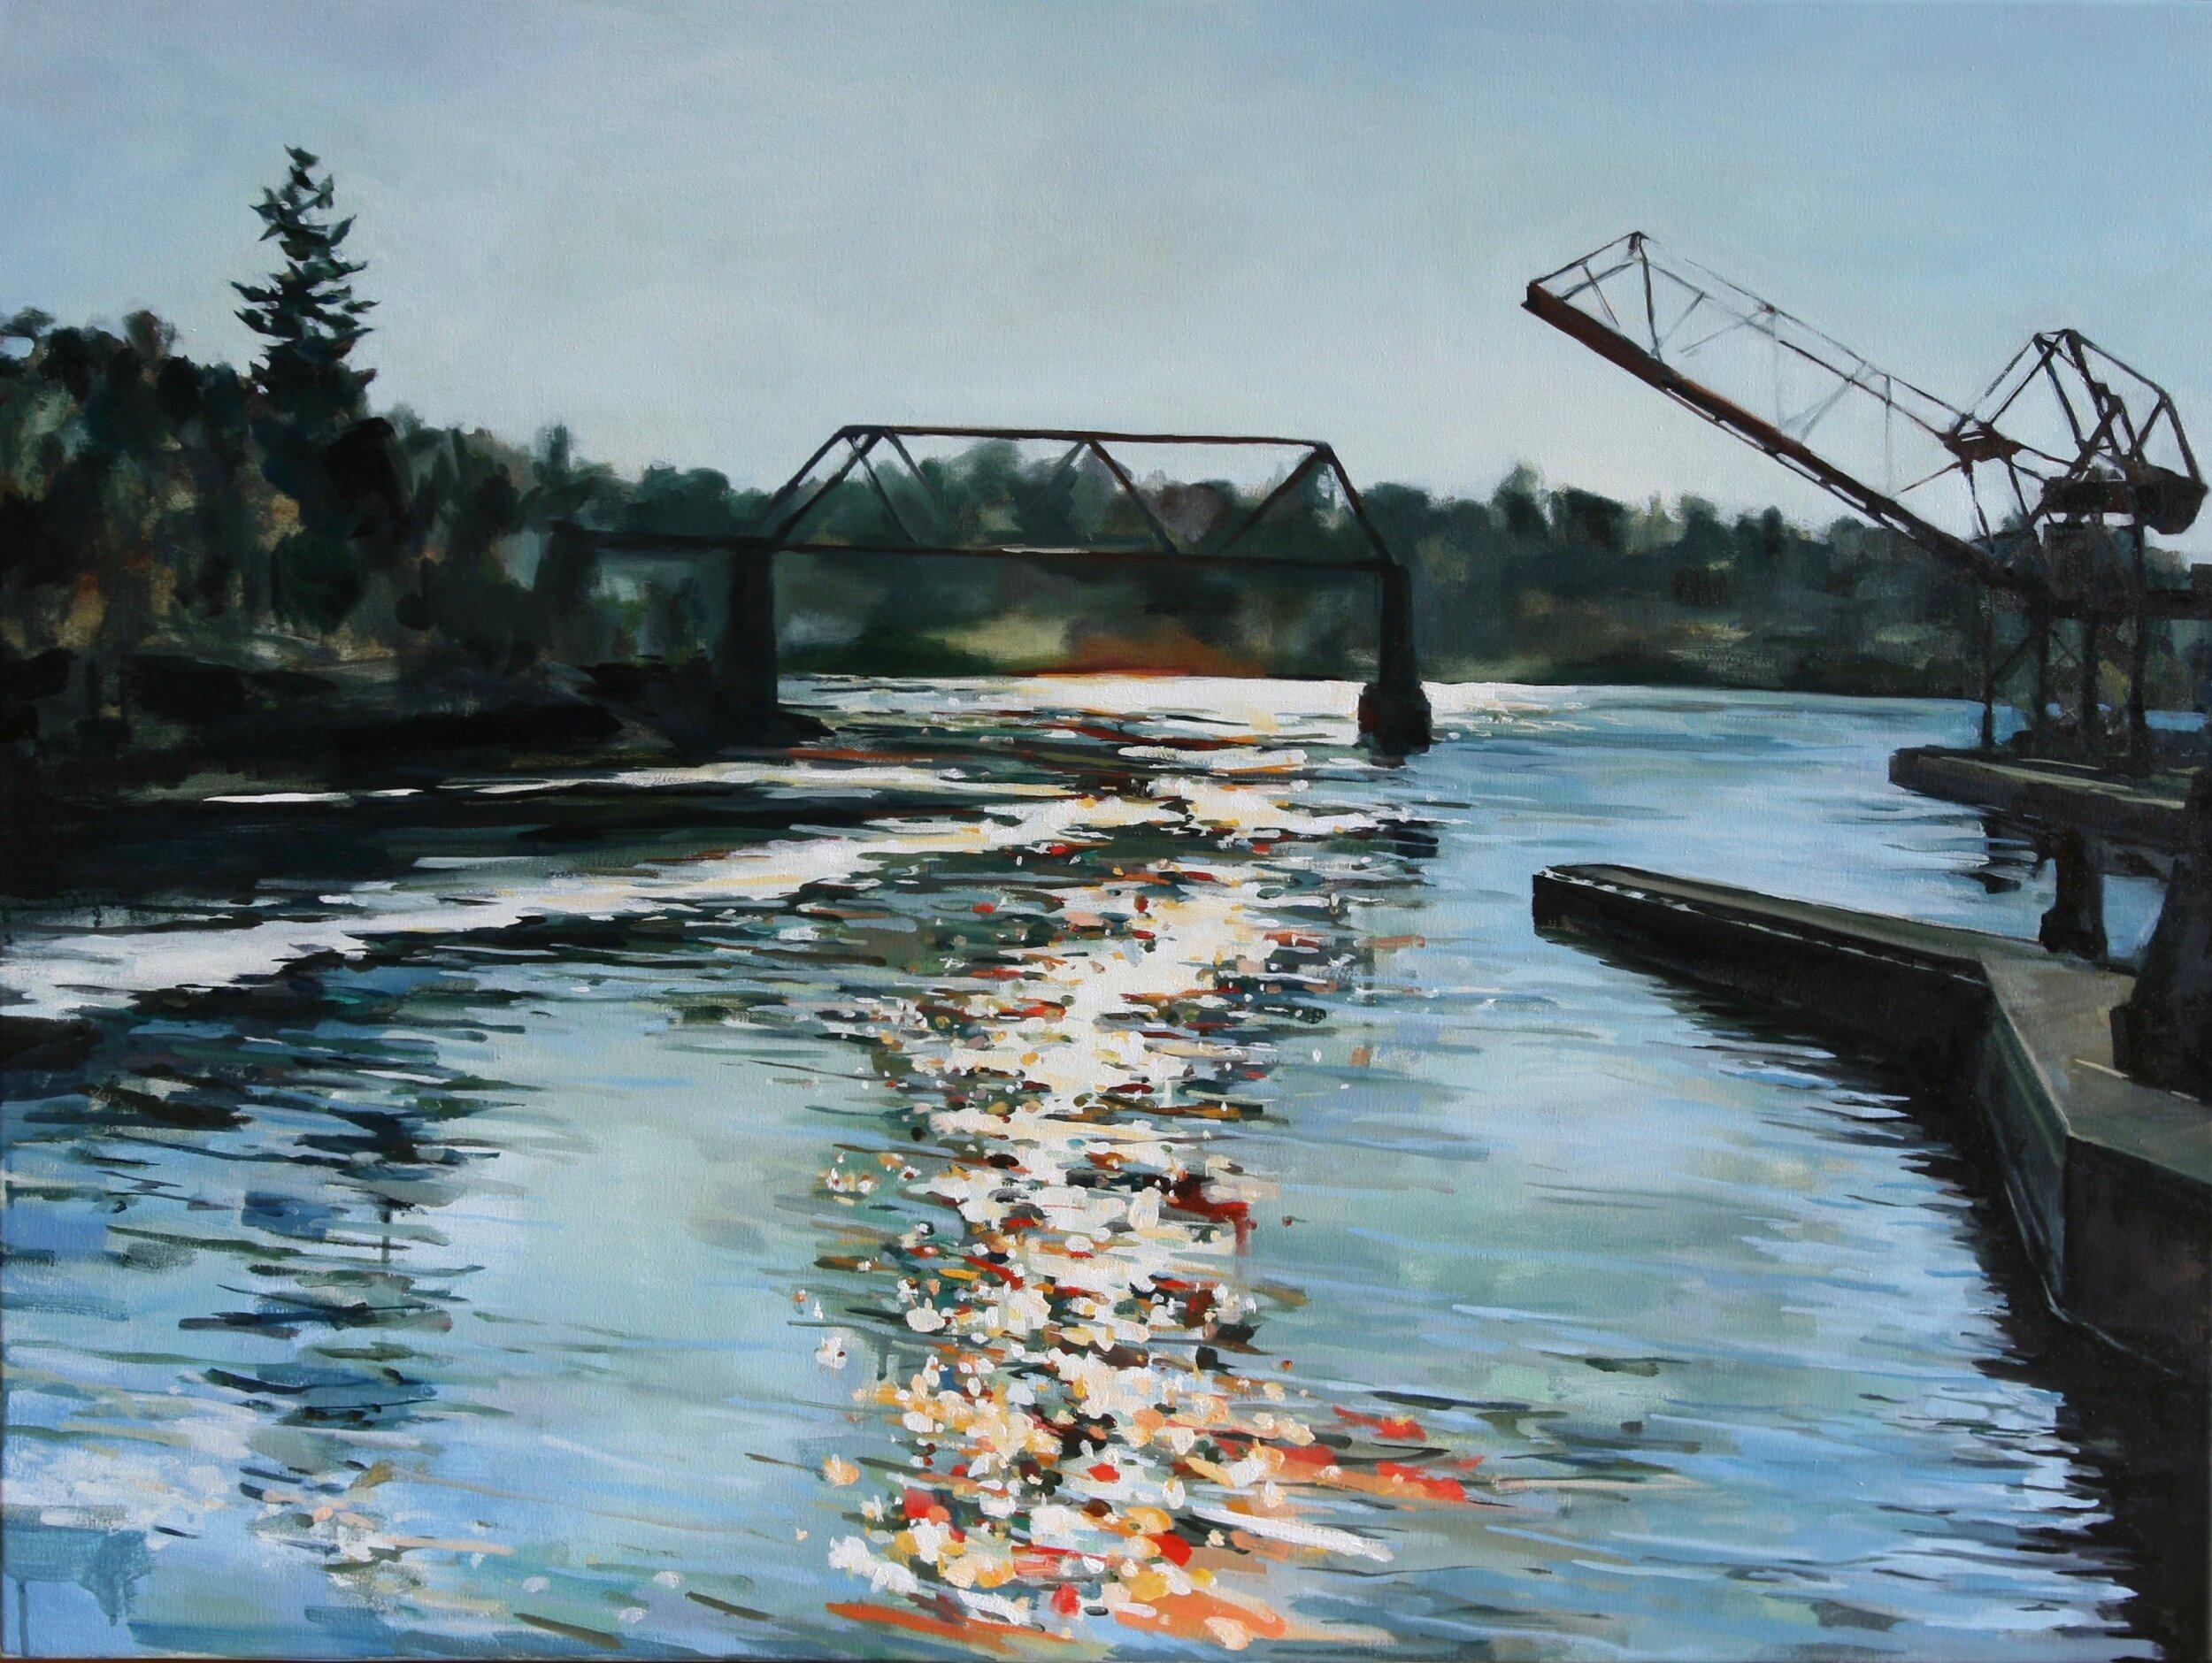 "'Ballard Locks'  2017  40"" x 30""  water soluble oil on canvas  sold"